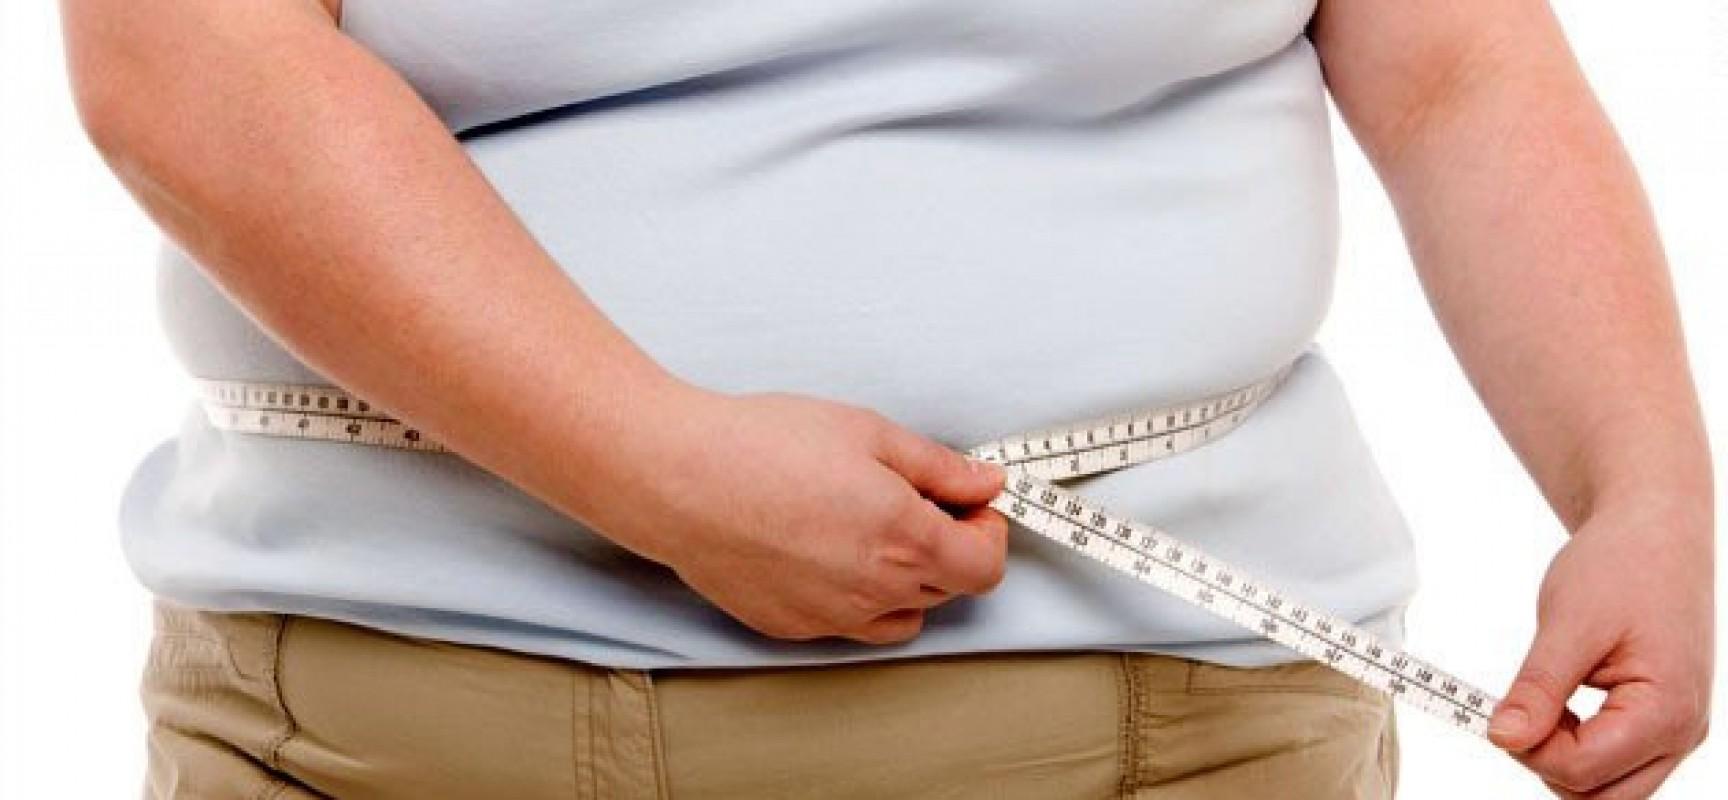 Resultado de imagen de sensacion gordura